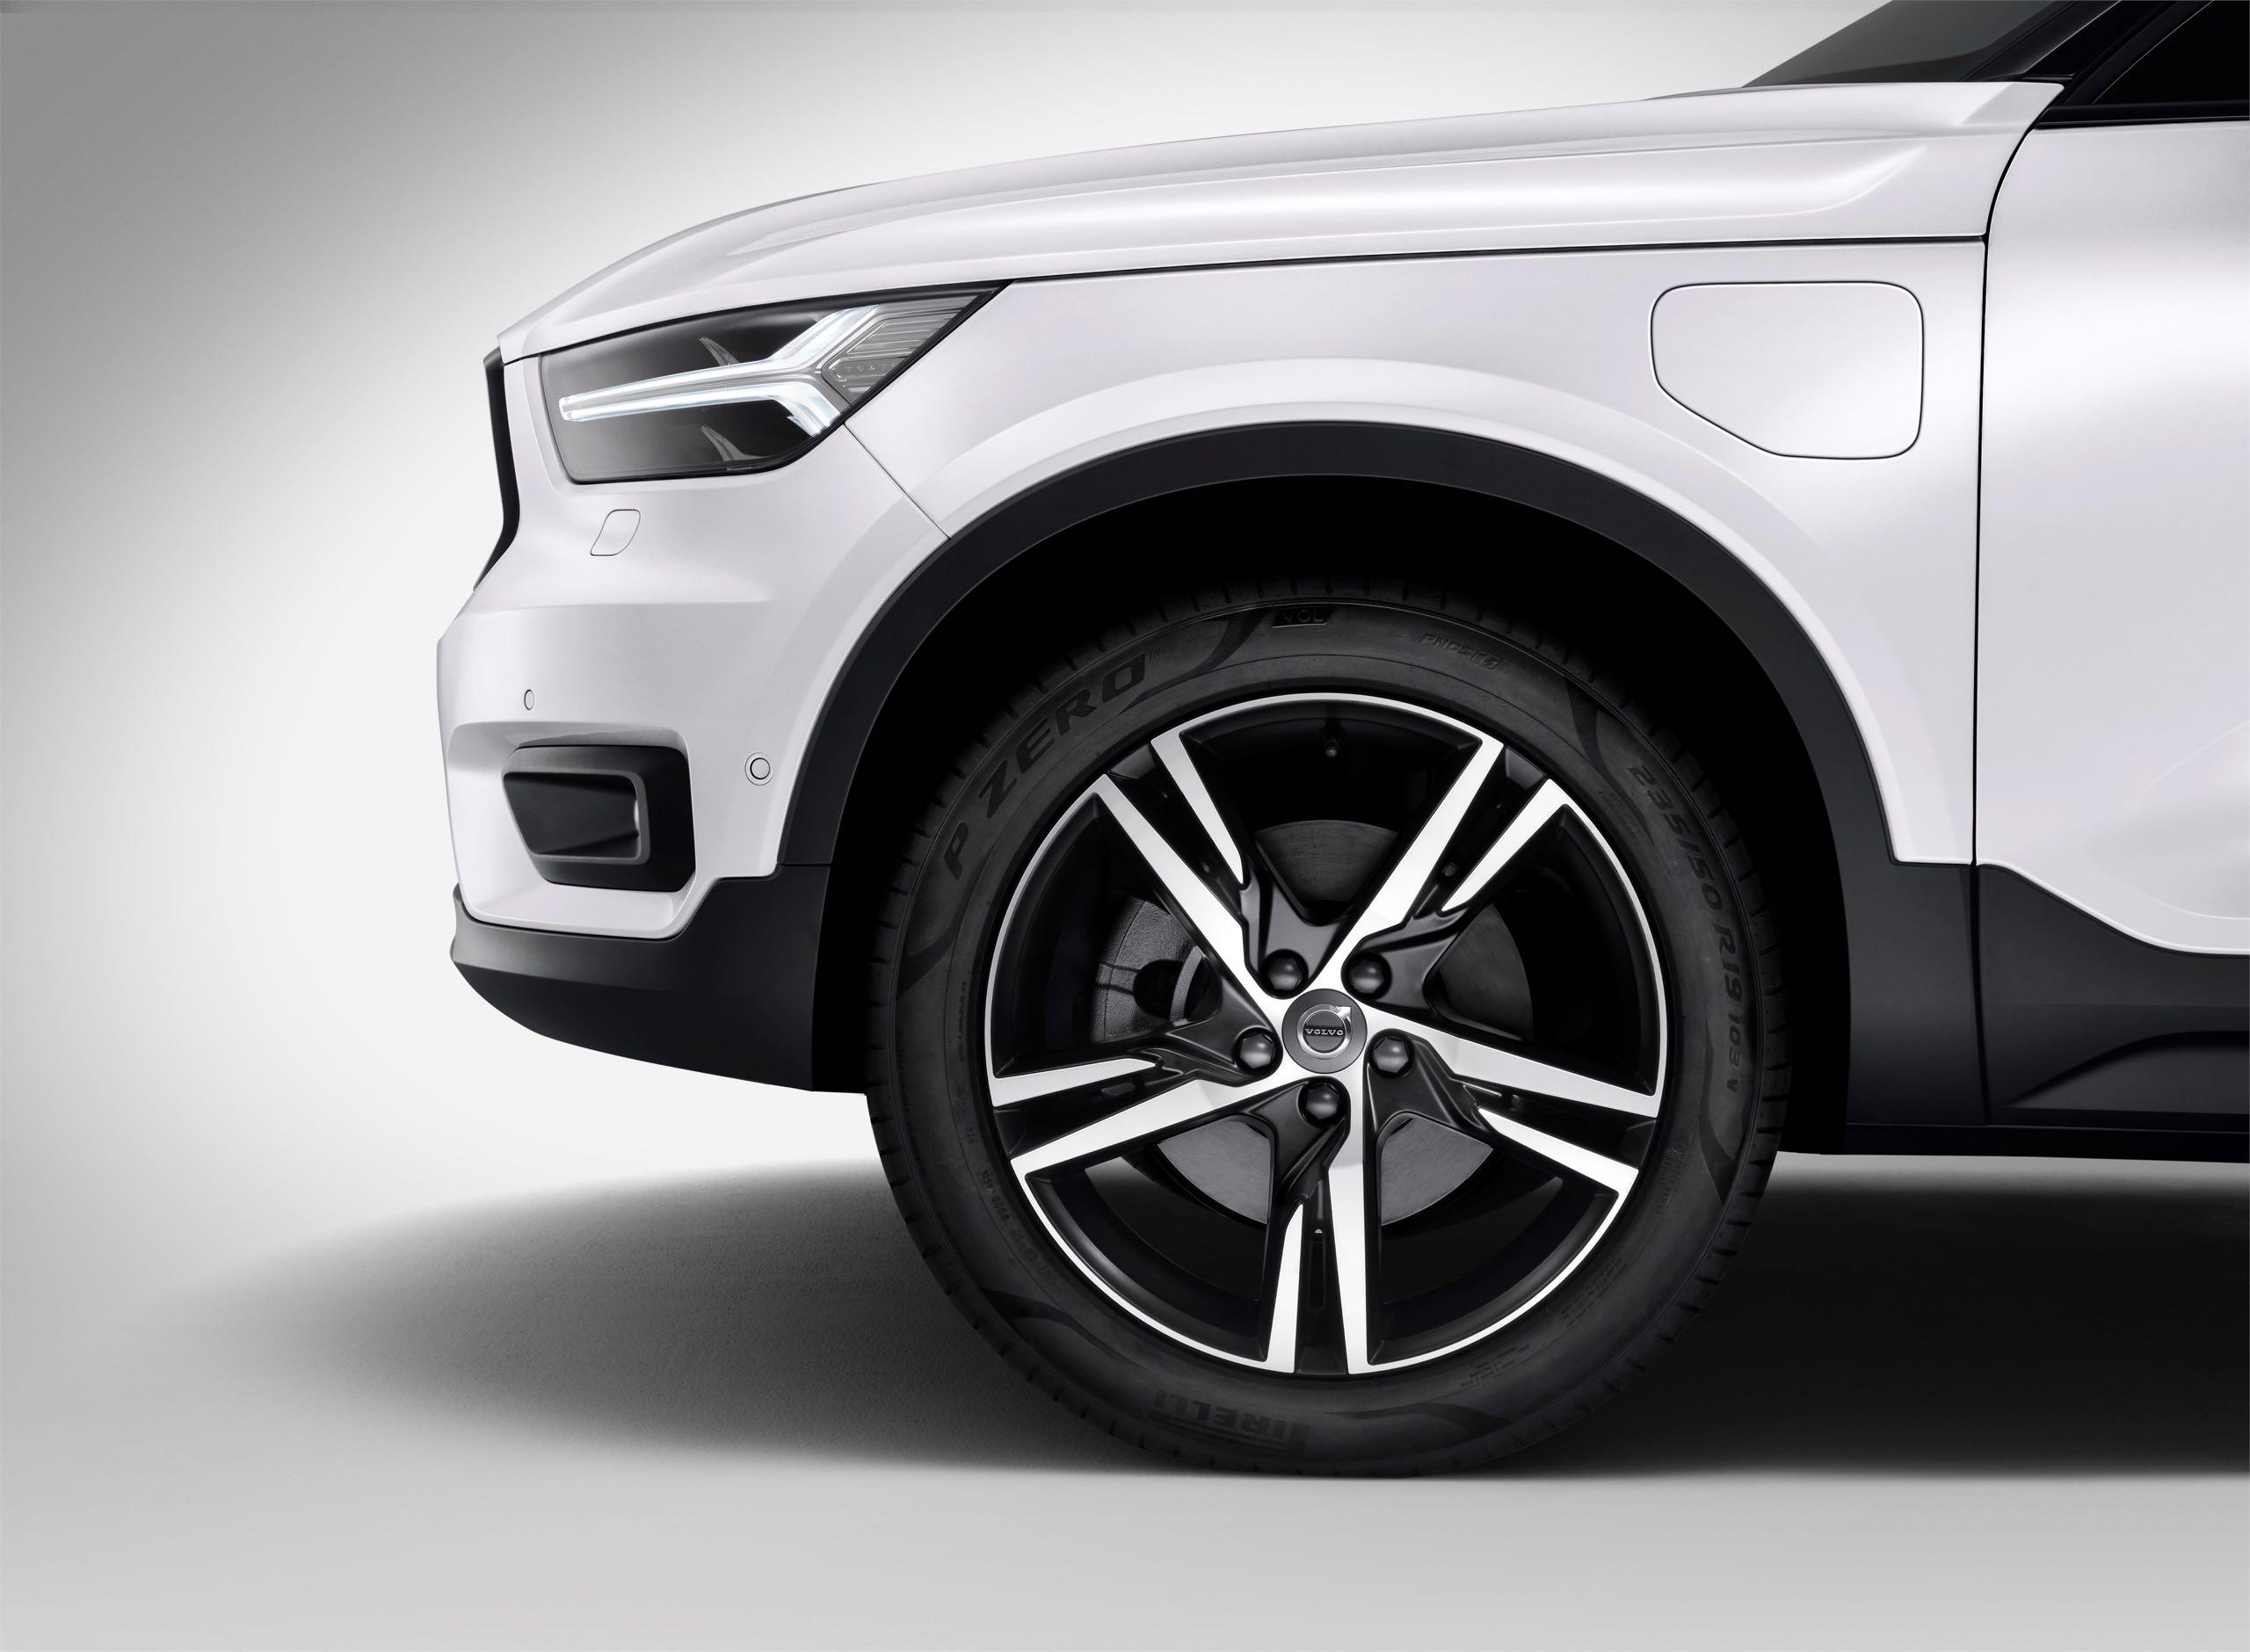 New Volvo XC40 T5 Plug In Hybrid -  2018, 2018 New XC40, Electrification, Exterior, Images, New XC40, Studio, Technology